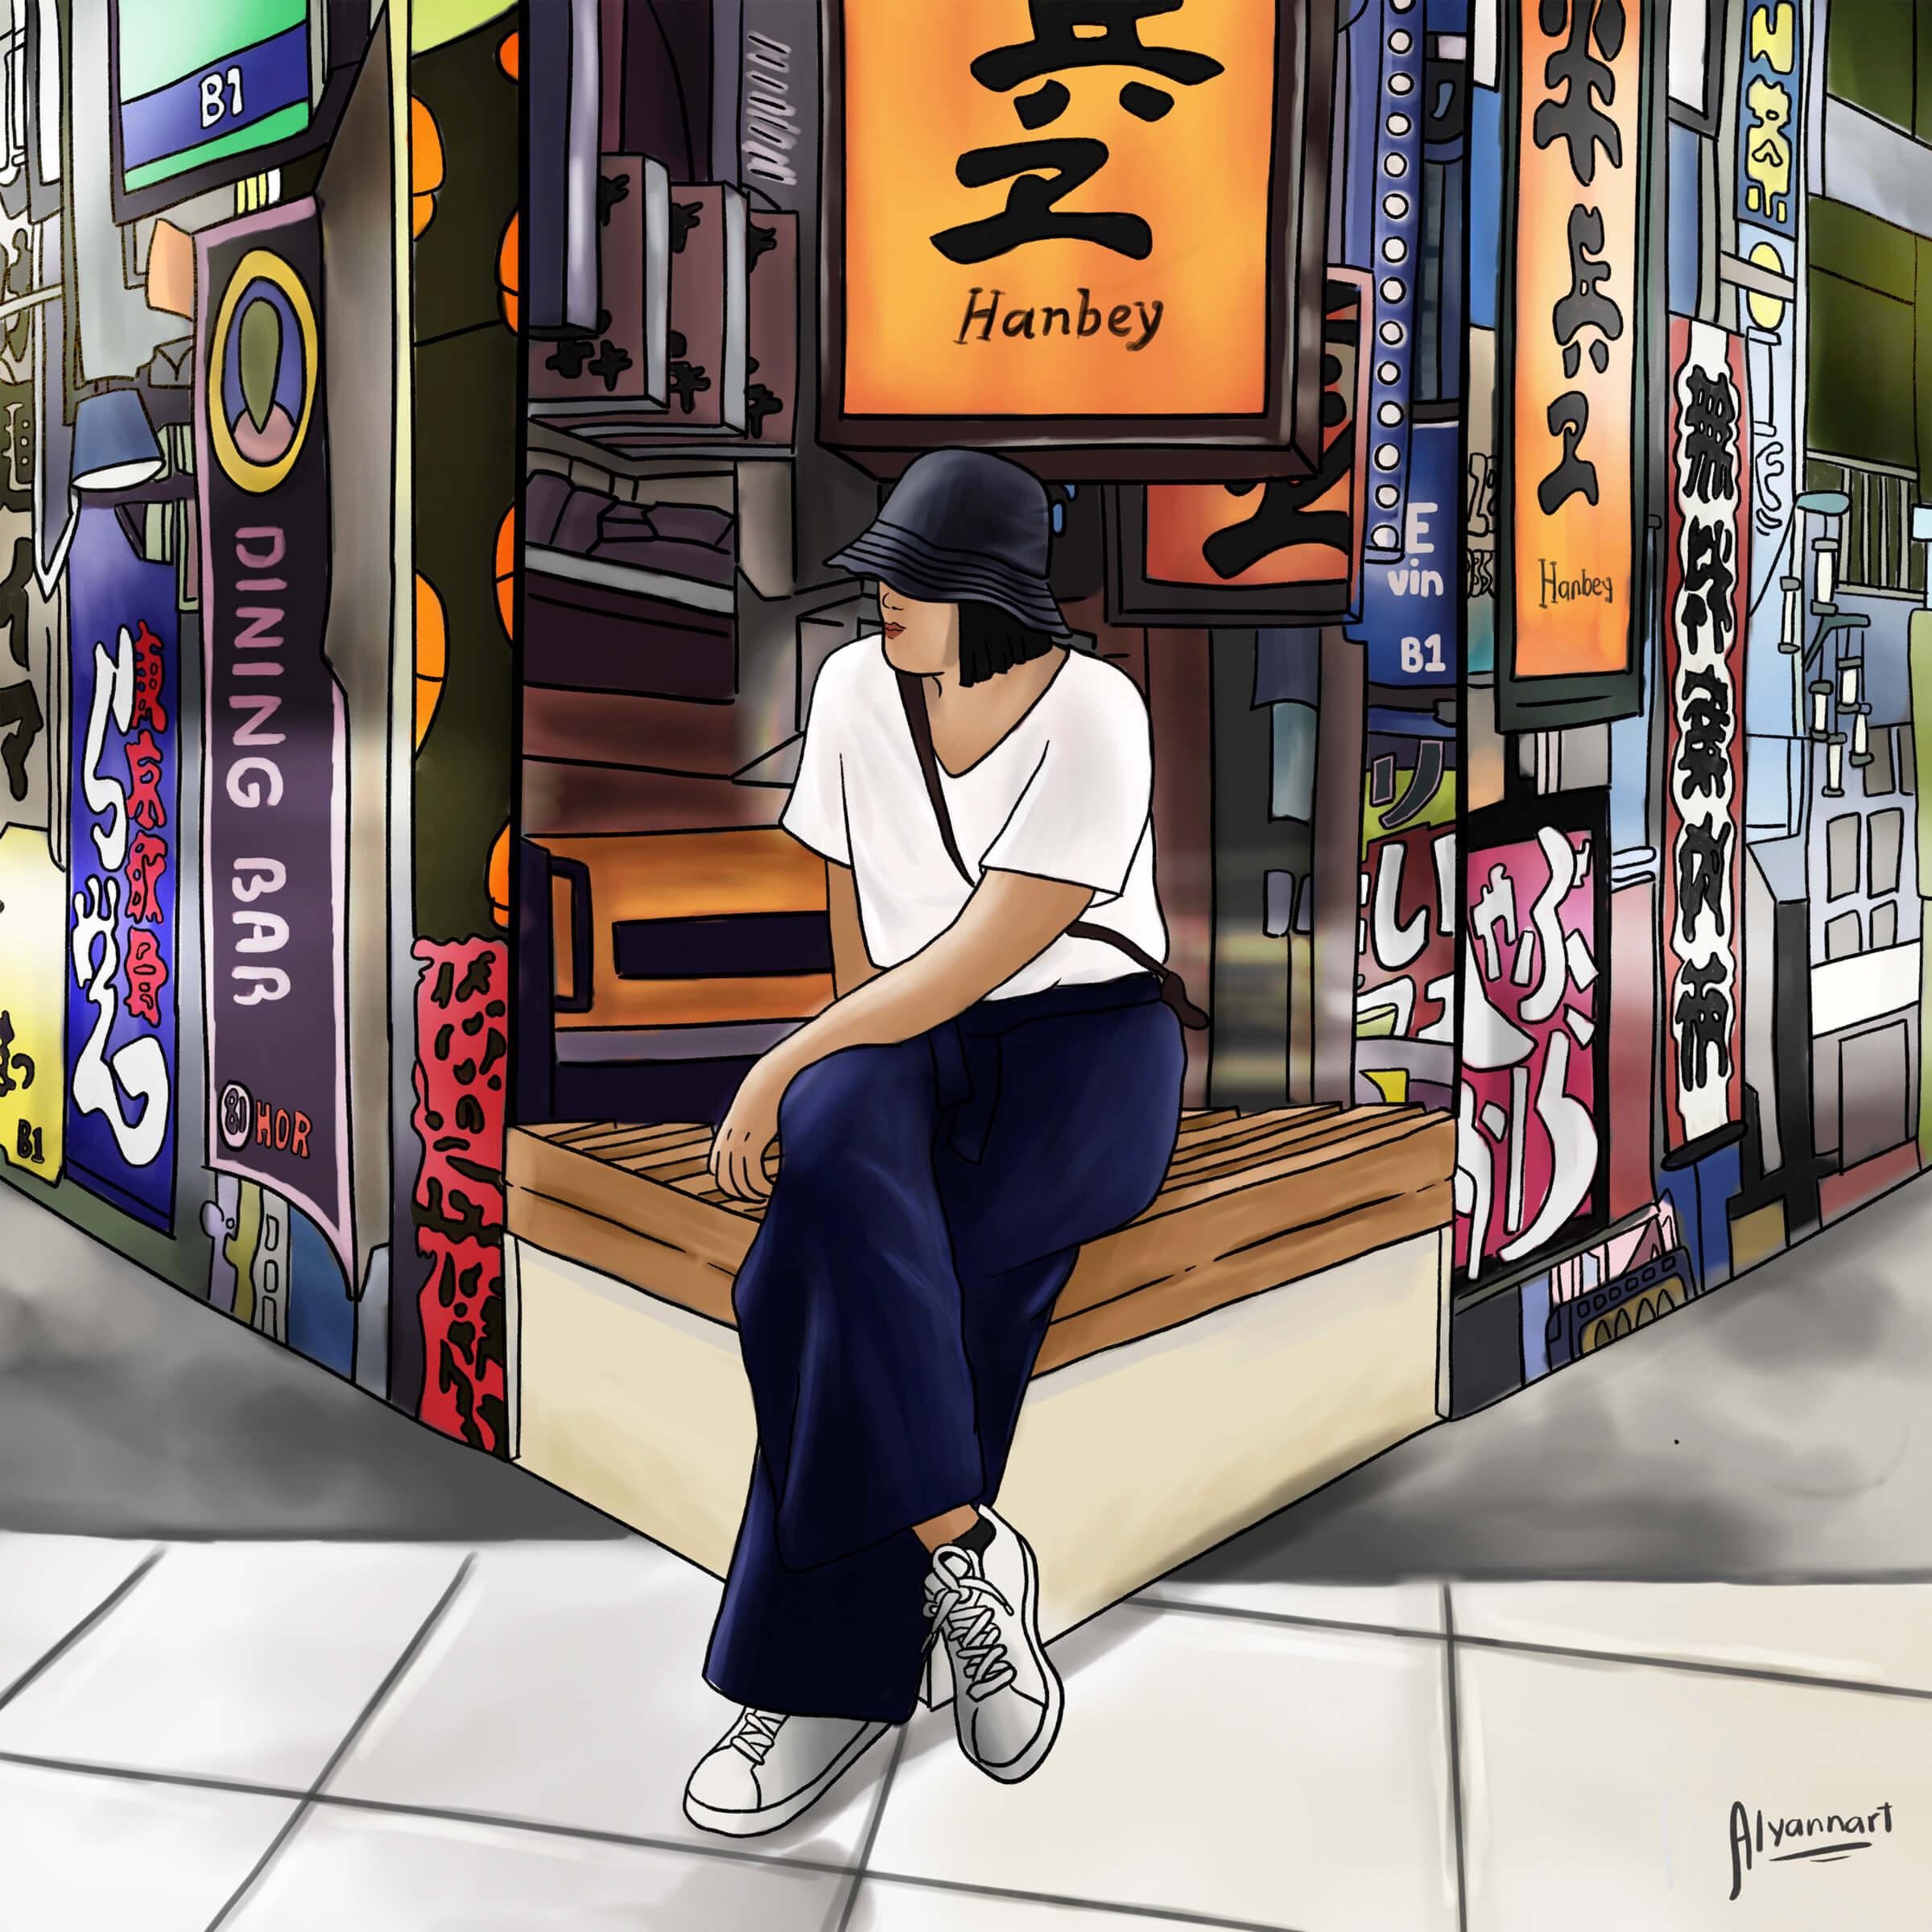 An artist's impression of Rhenz sitting in a Hong Kong street